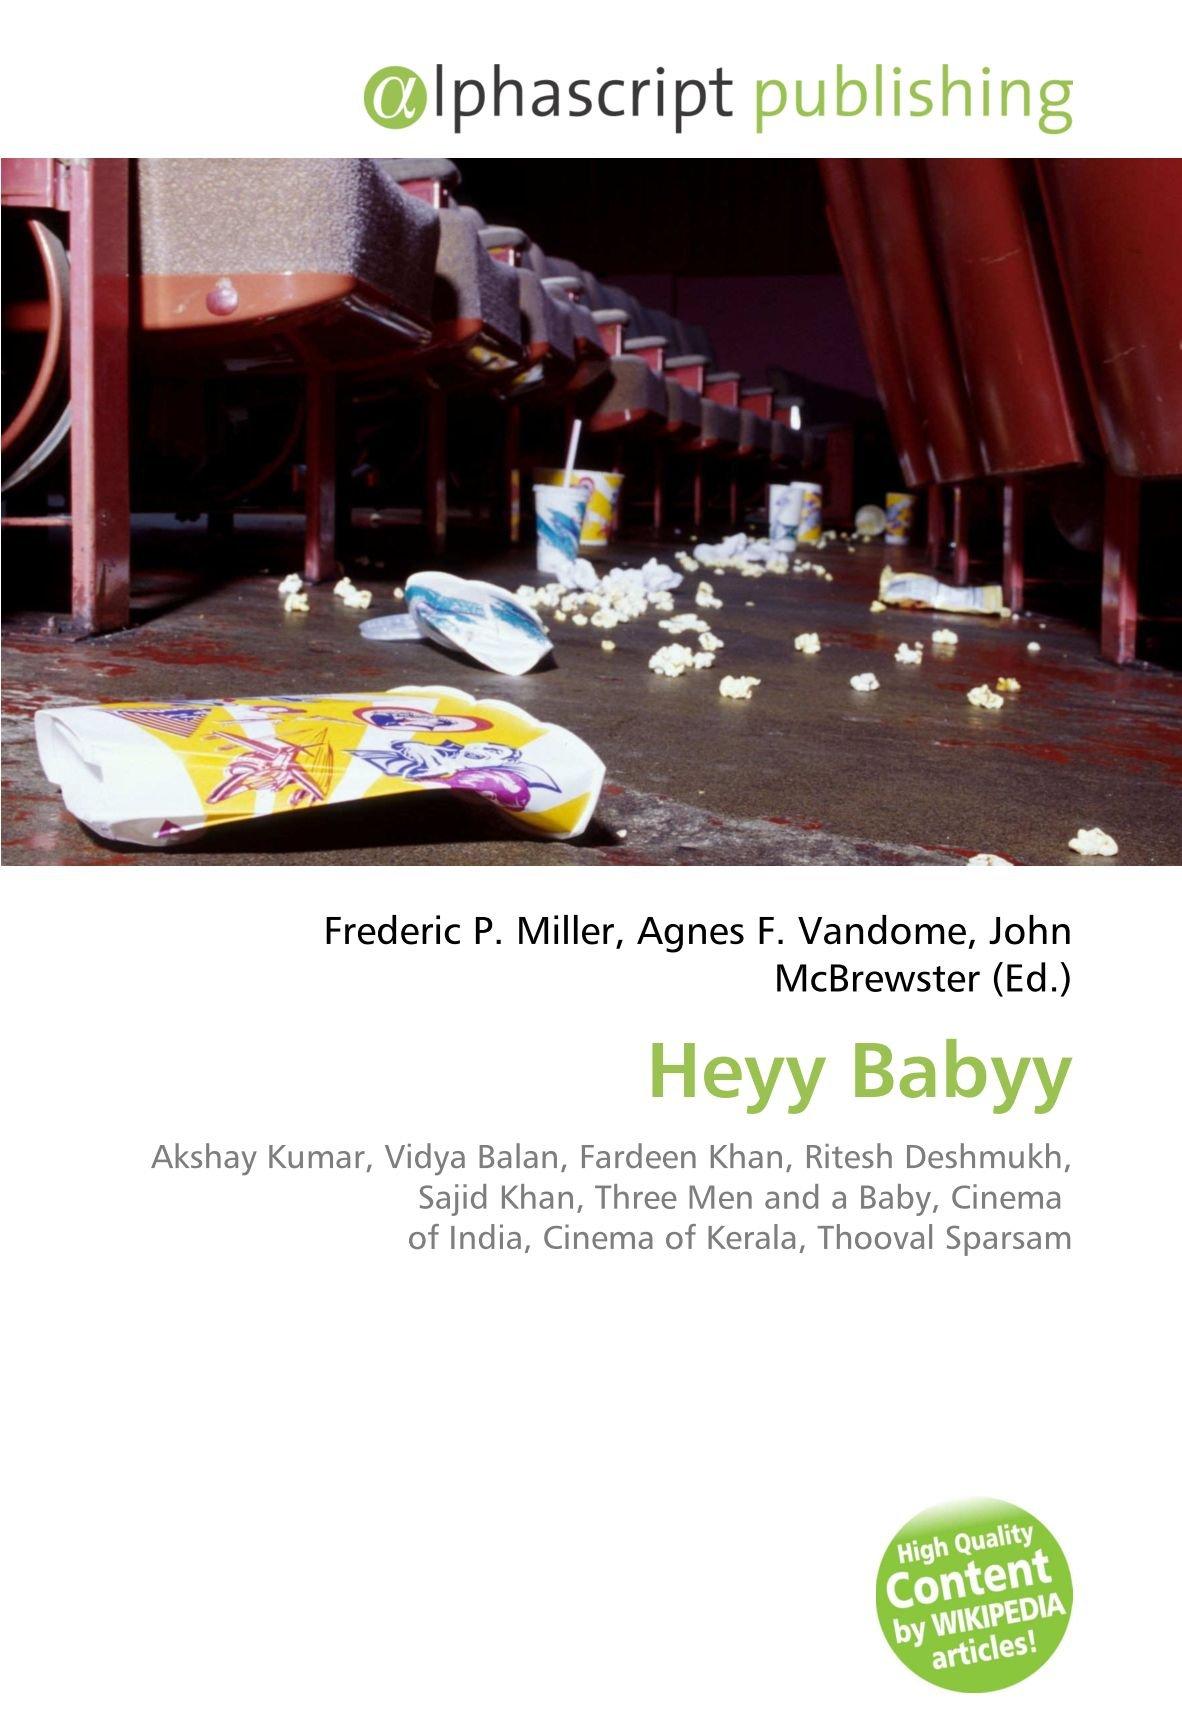 Heyy Babyy: Amazon.es: Miller, Frederic P., Vandome, Agnes F., McBrewster, John: Libros en idiomas extranjeros